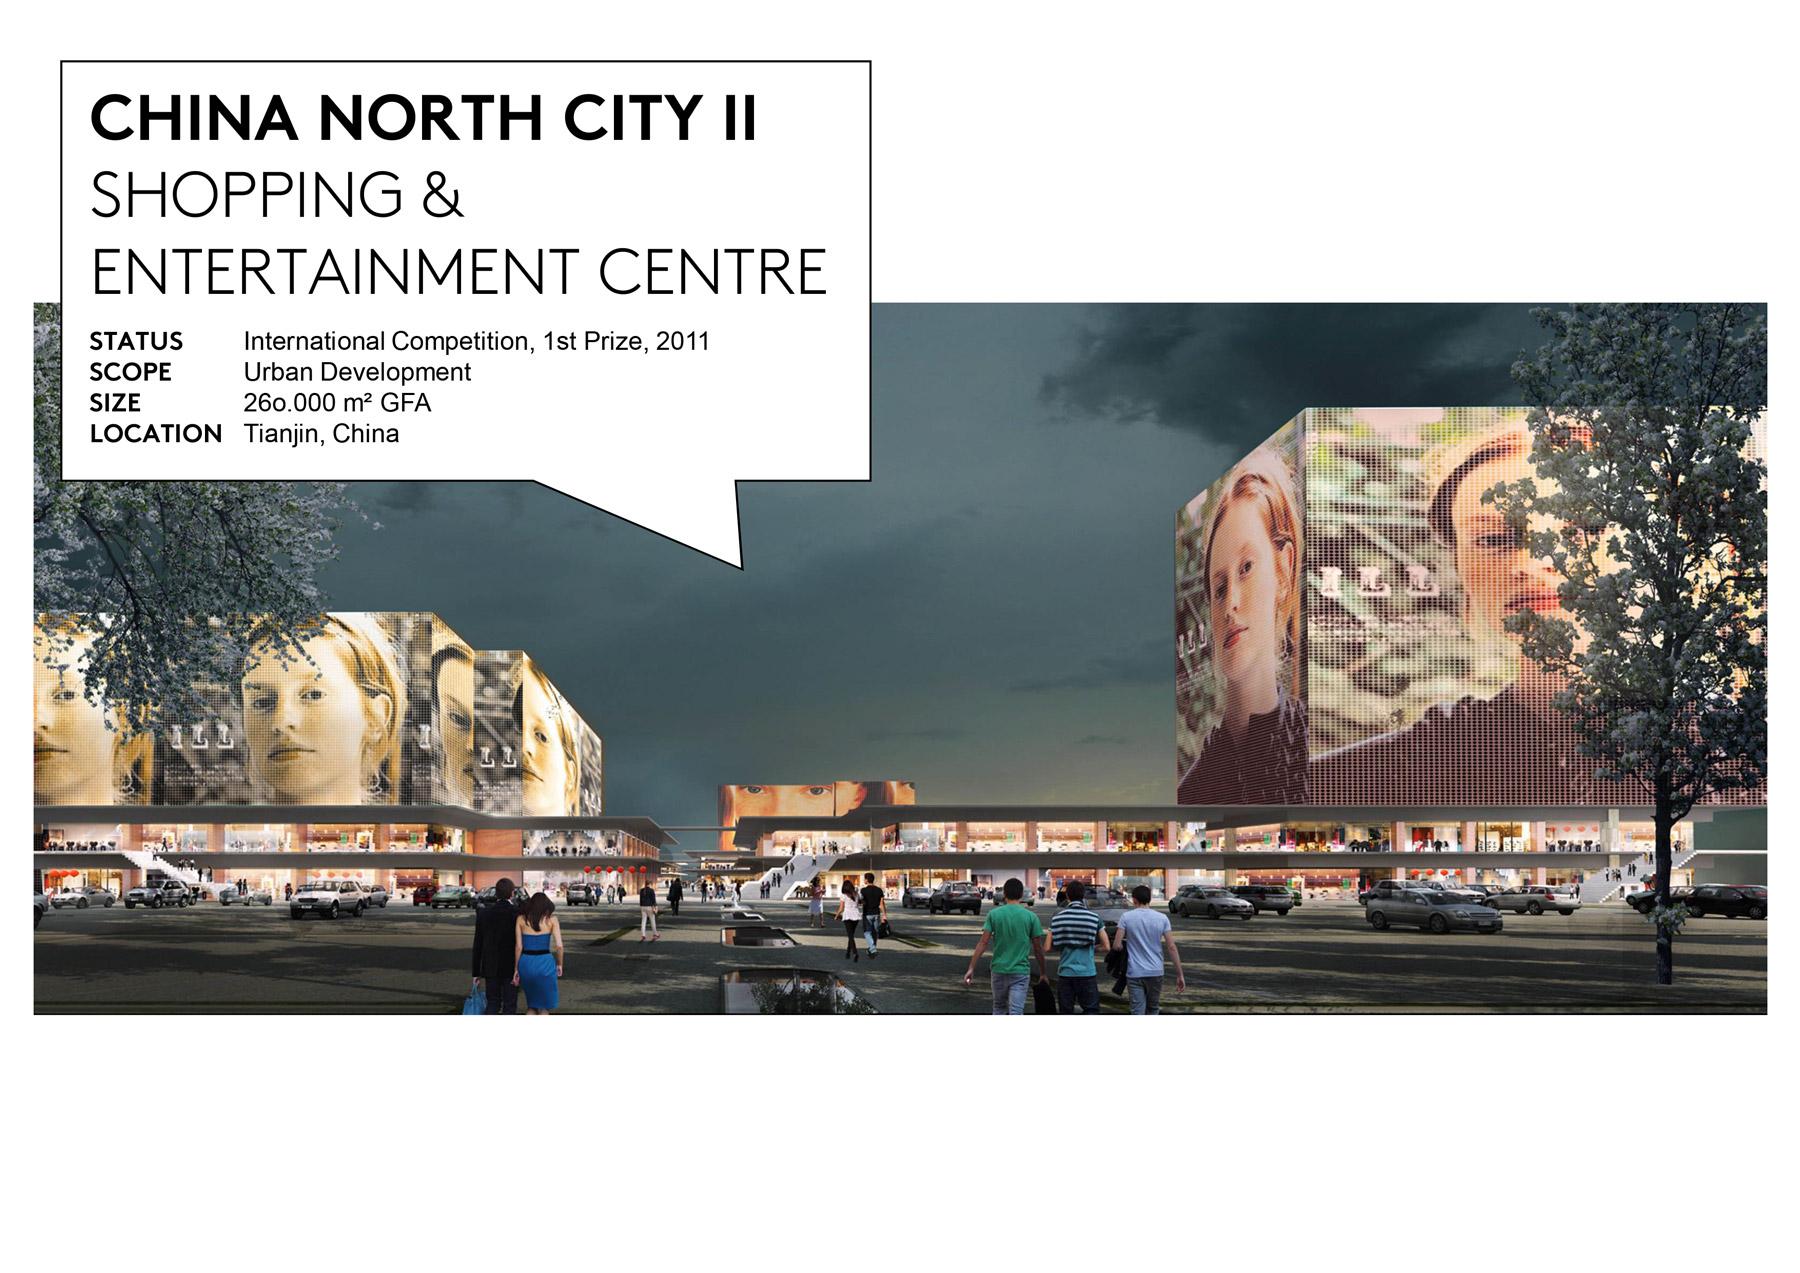 098_China North City_II_slide_02